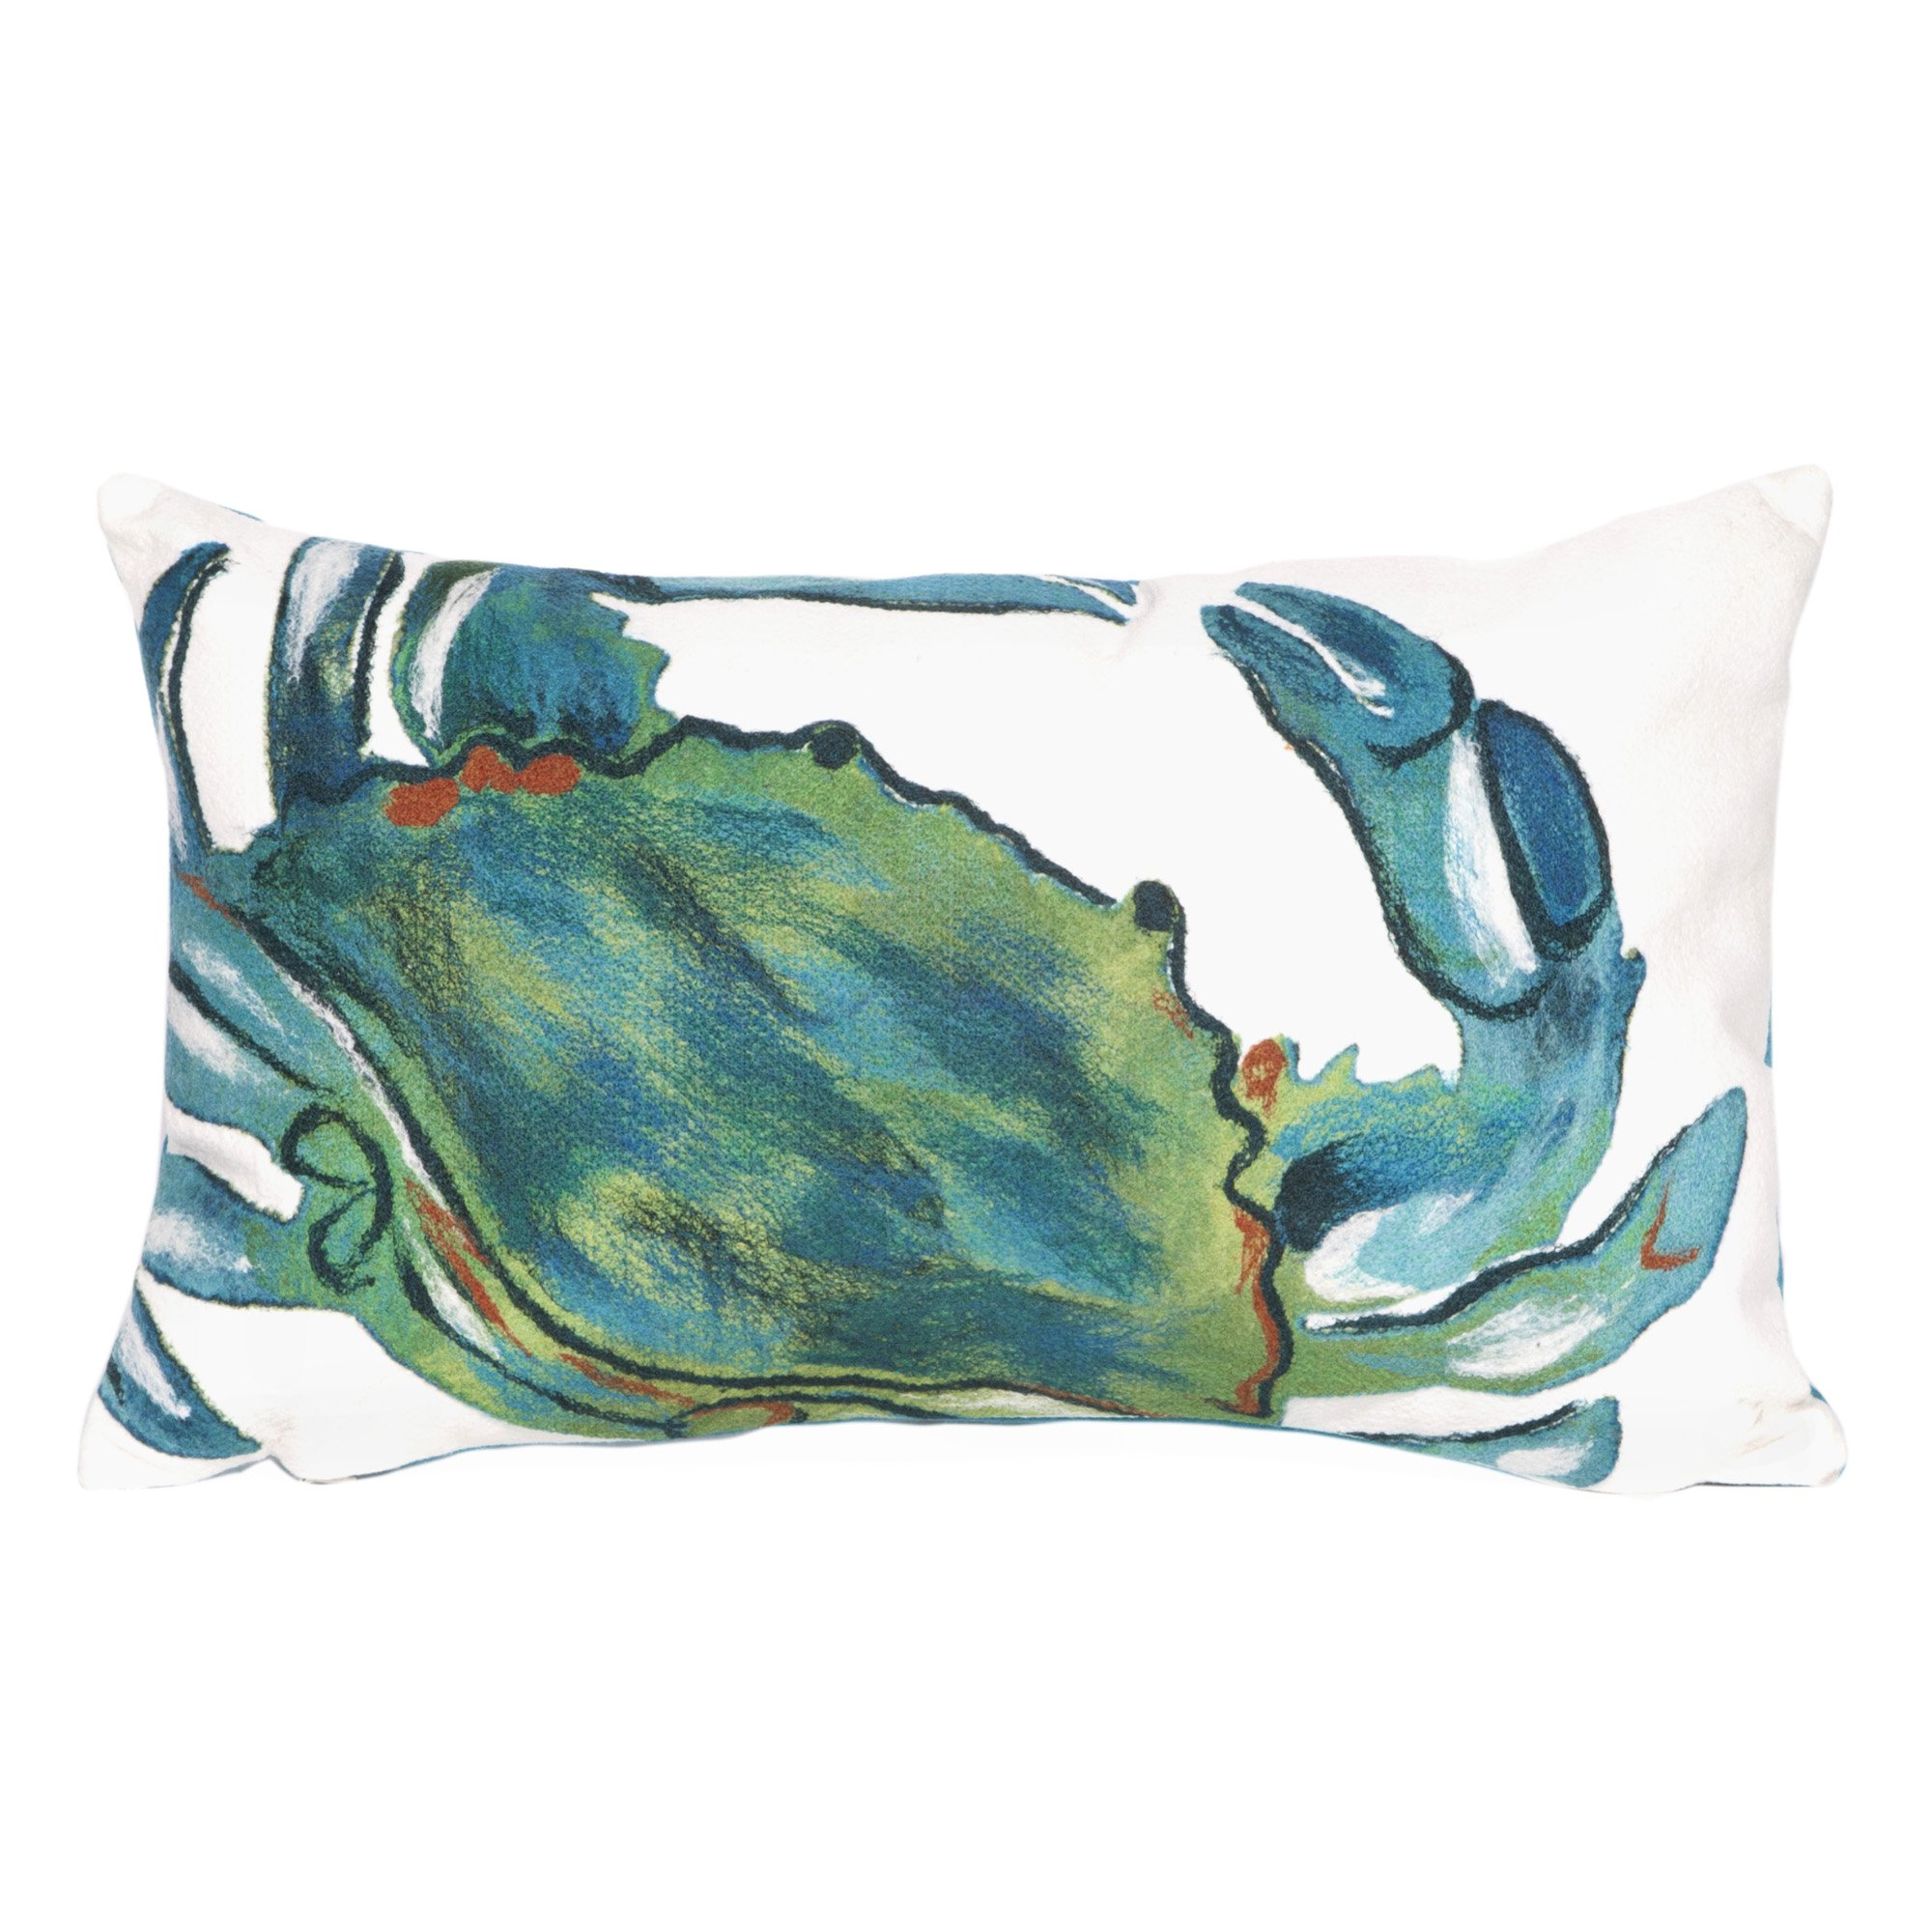 Liora Manne 7S01SA39403 Mystic III Sand Crawler Sea Indoor/Outdoor Pillow